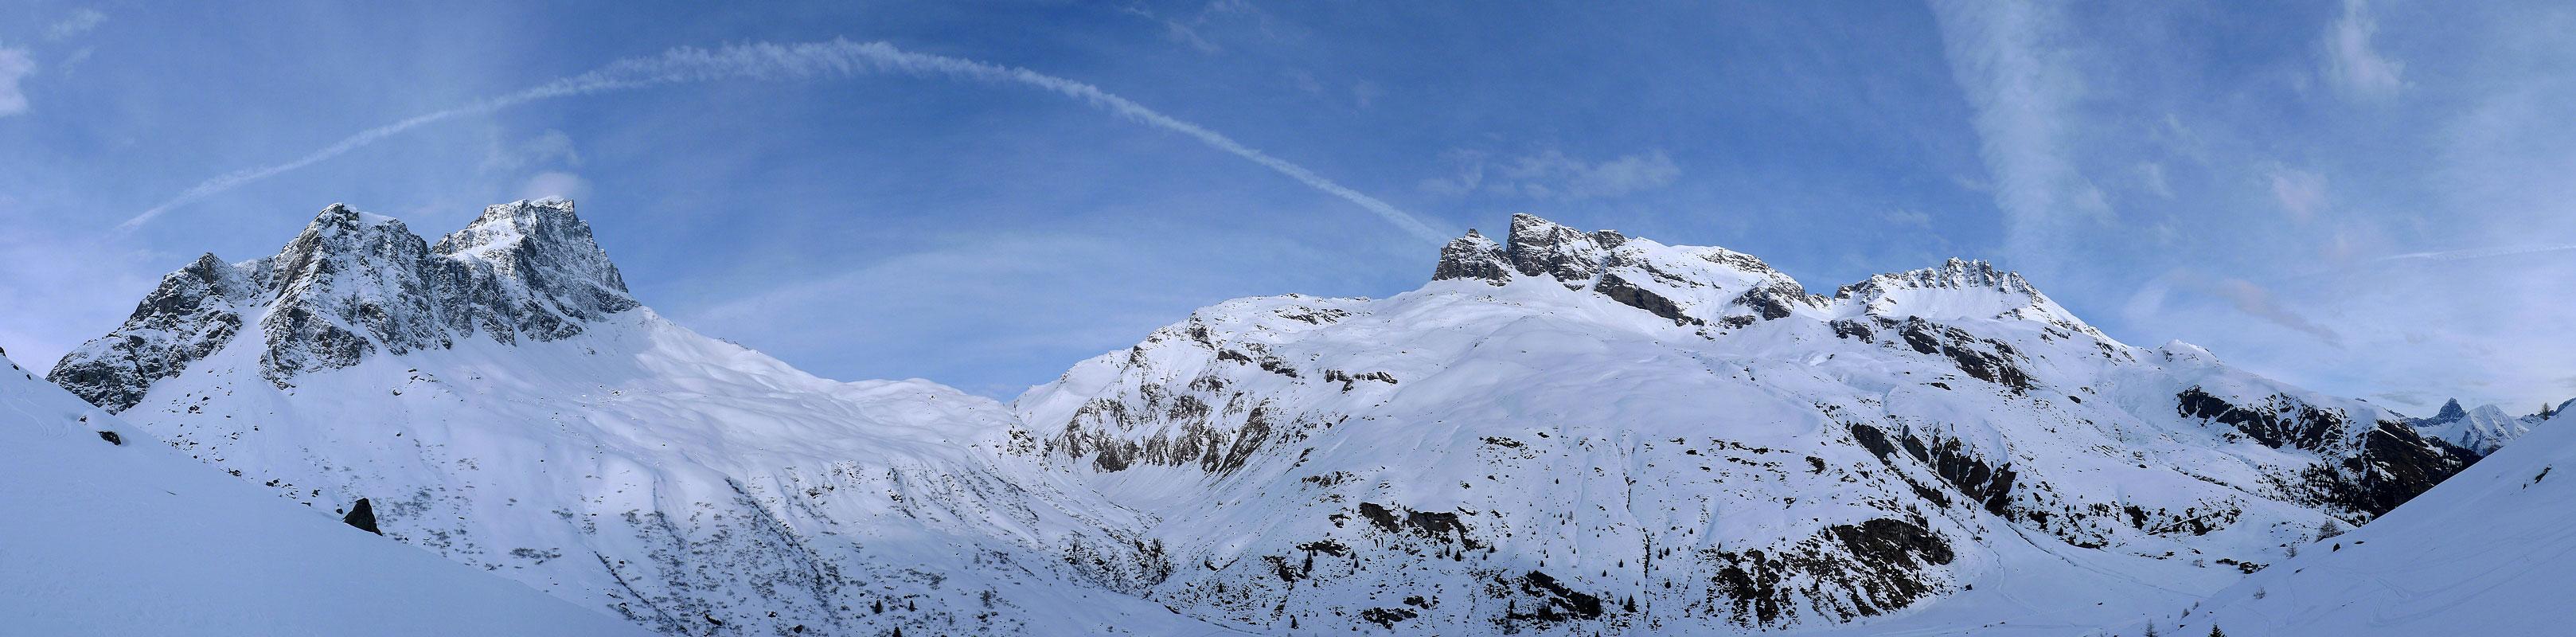 Piz Platta Plattagruppe / Oberhalbstein Switzerland panorama 10